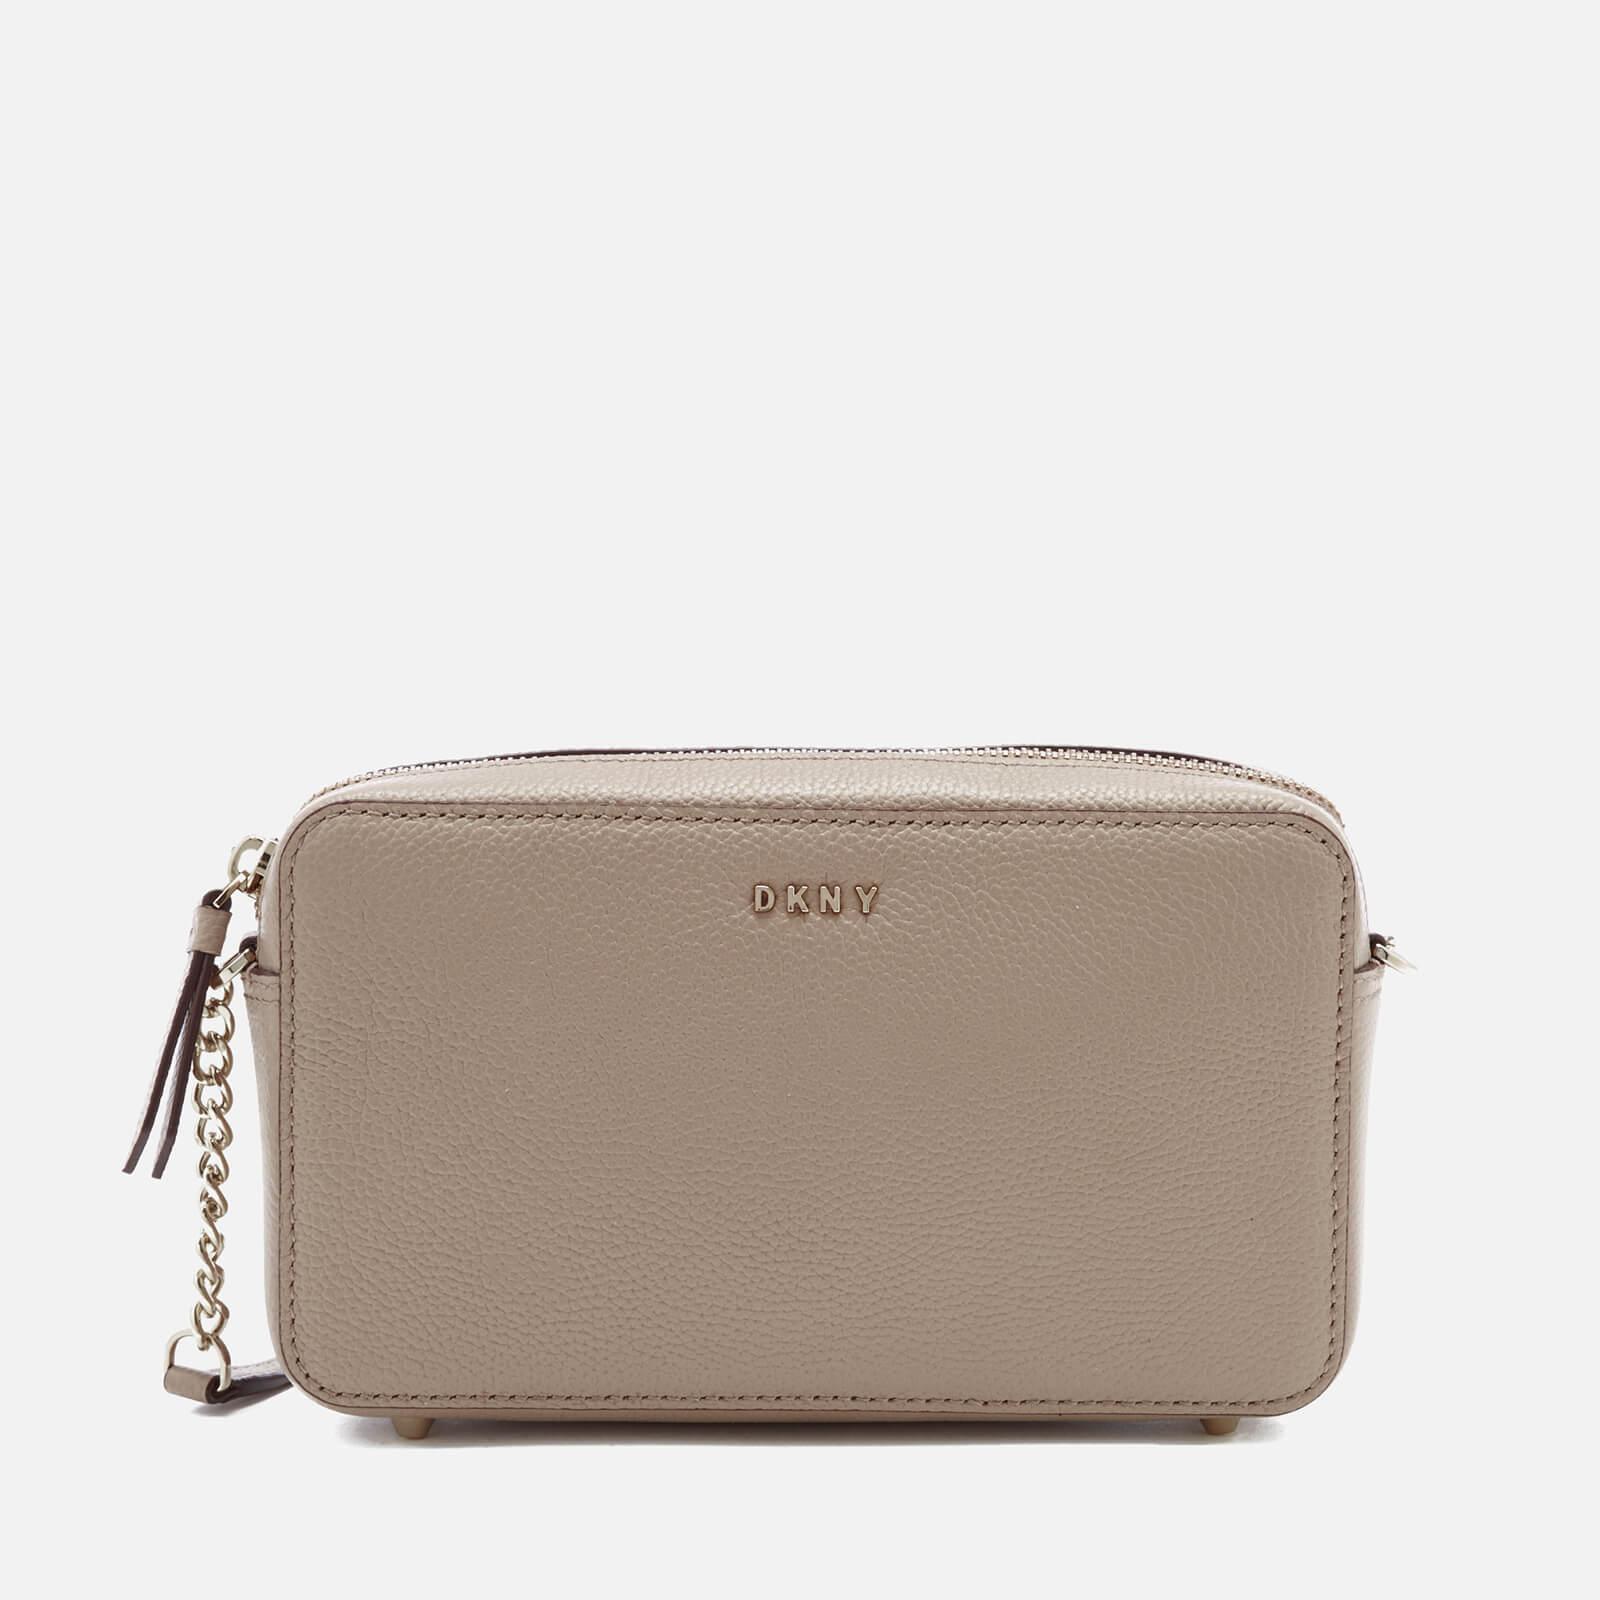 eb3768fc DKNY Women's Chelsea Pebbled Small Leather Top Zip Cross Body Bag - Buff